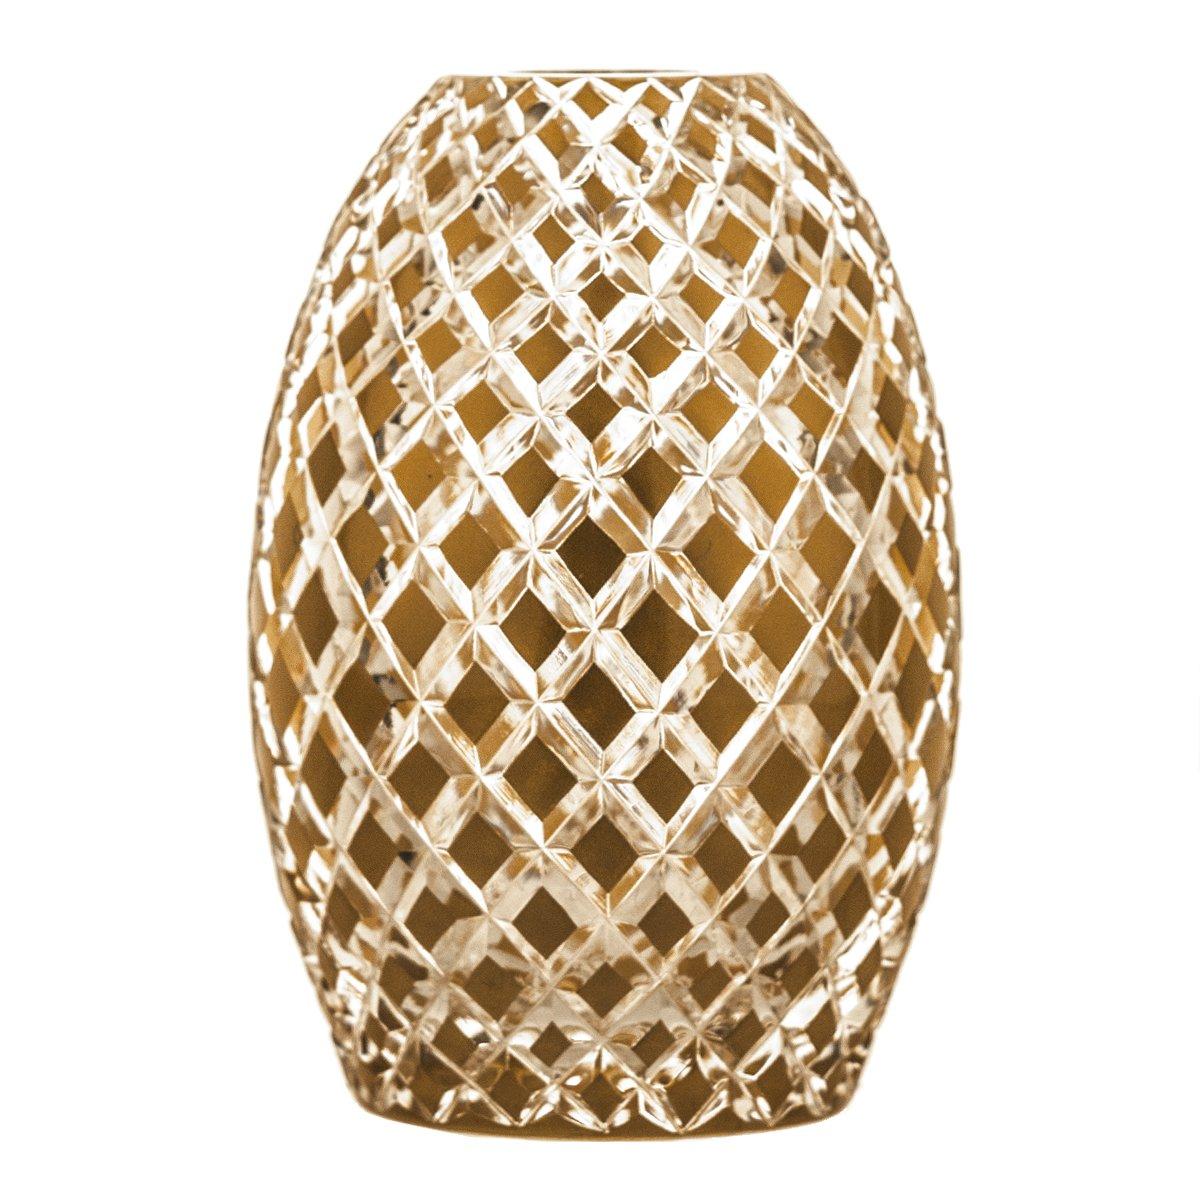 Crystaljulia 5433 Vase Vase Vase Bleikristall Gold B07F2L95ZK Vasen aac5ae